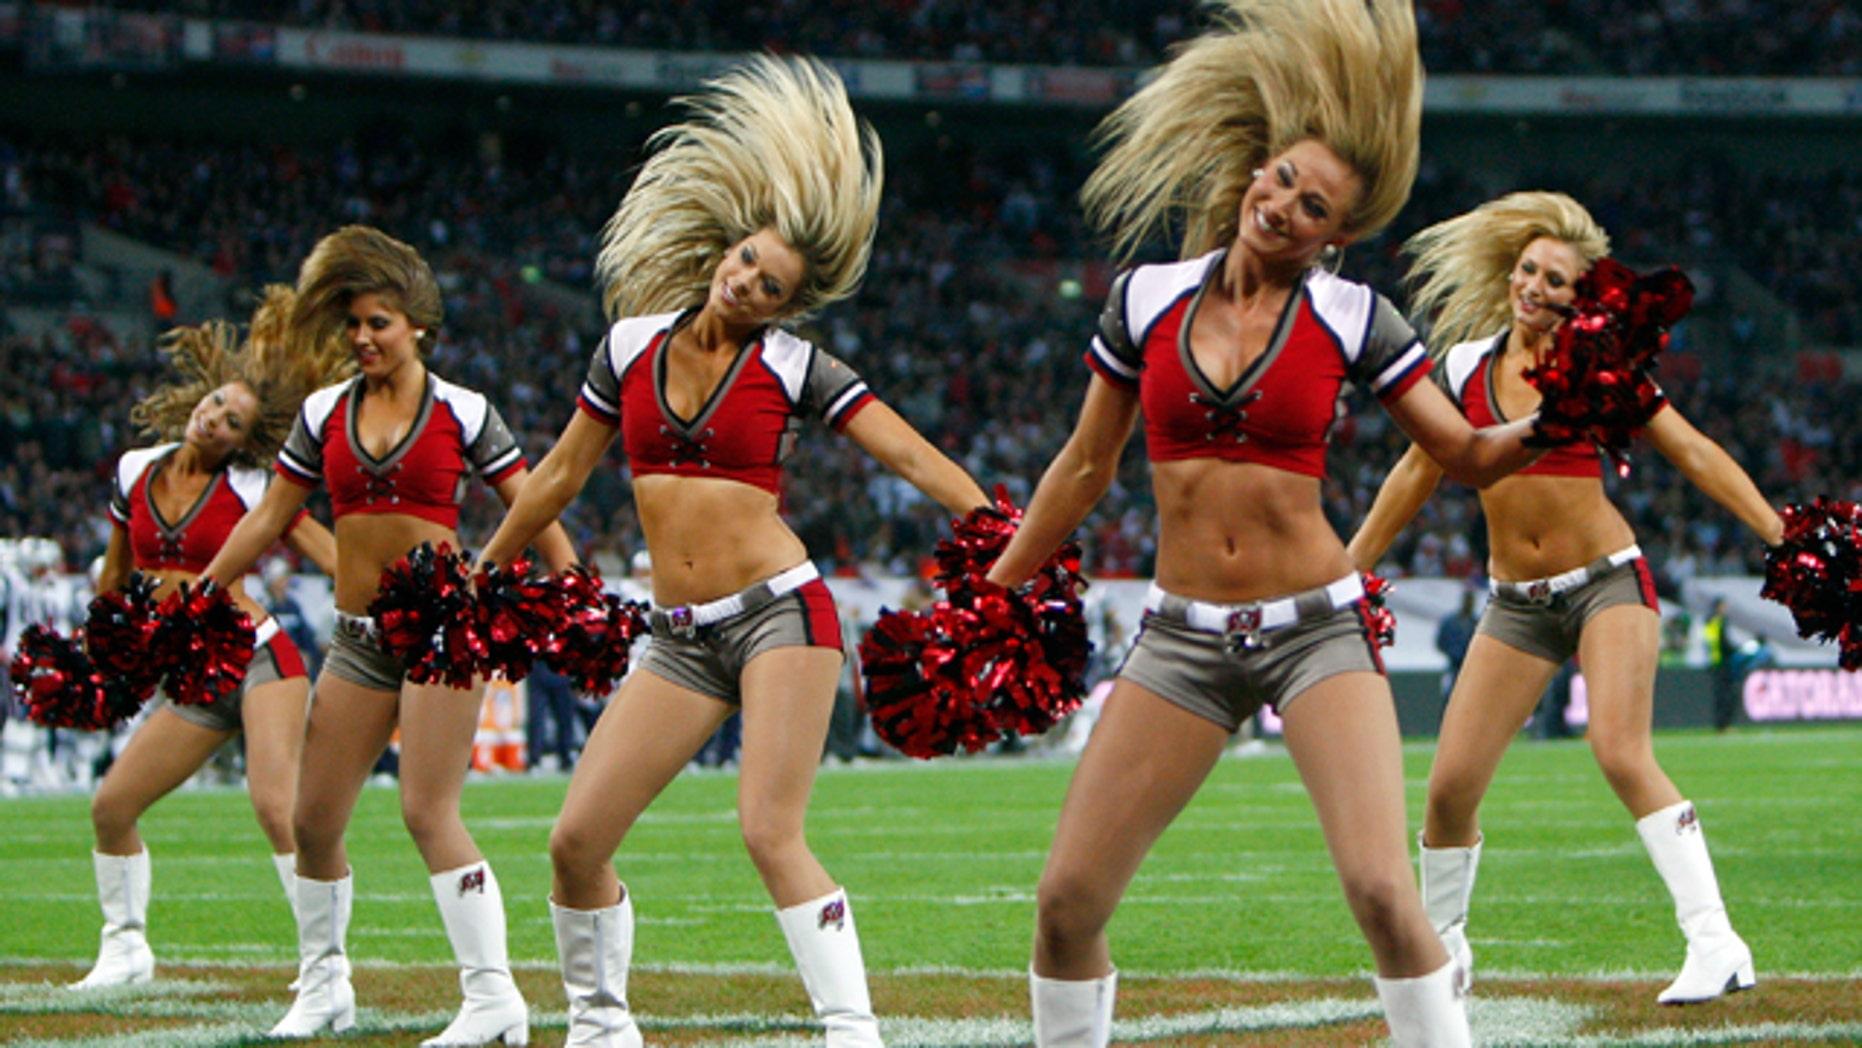 The Tampa Bay Buccaneers cheerleaders. (Reuters)